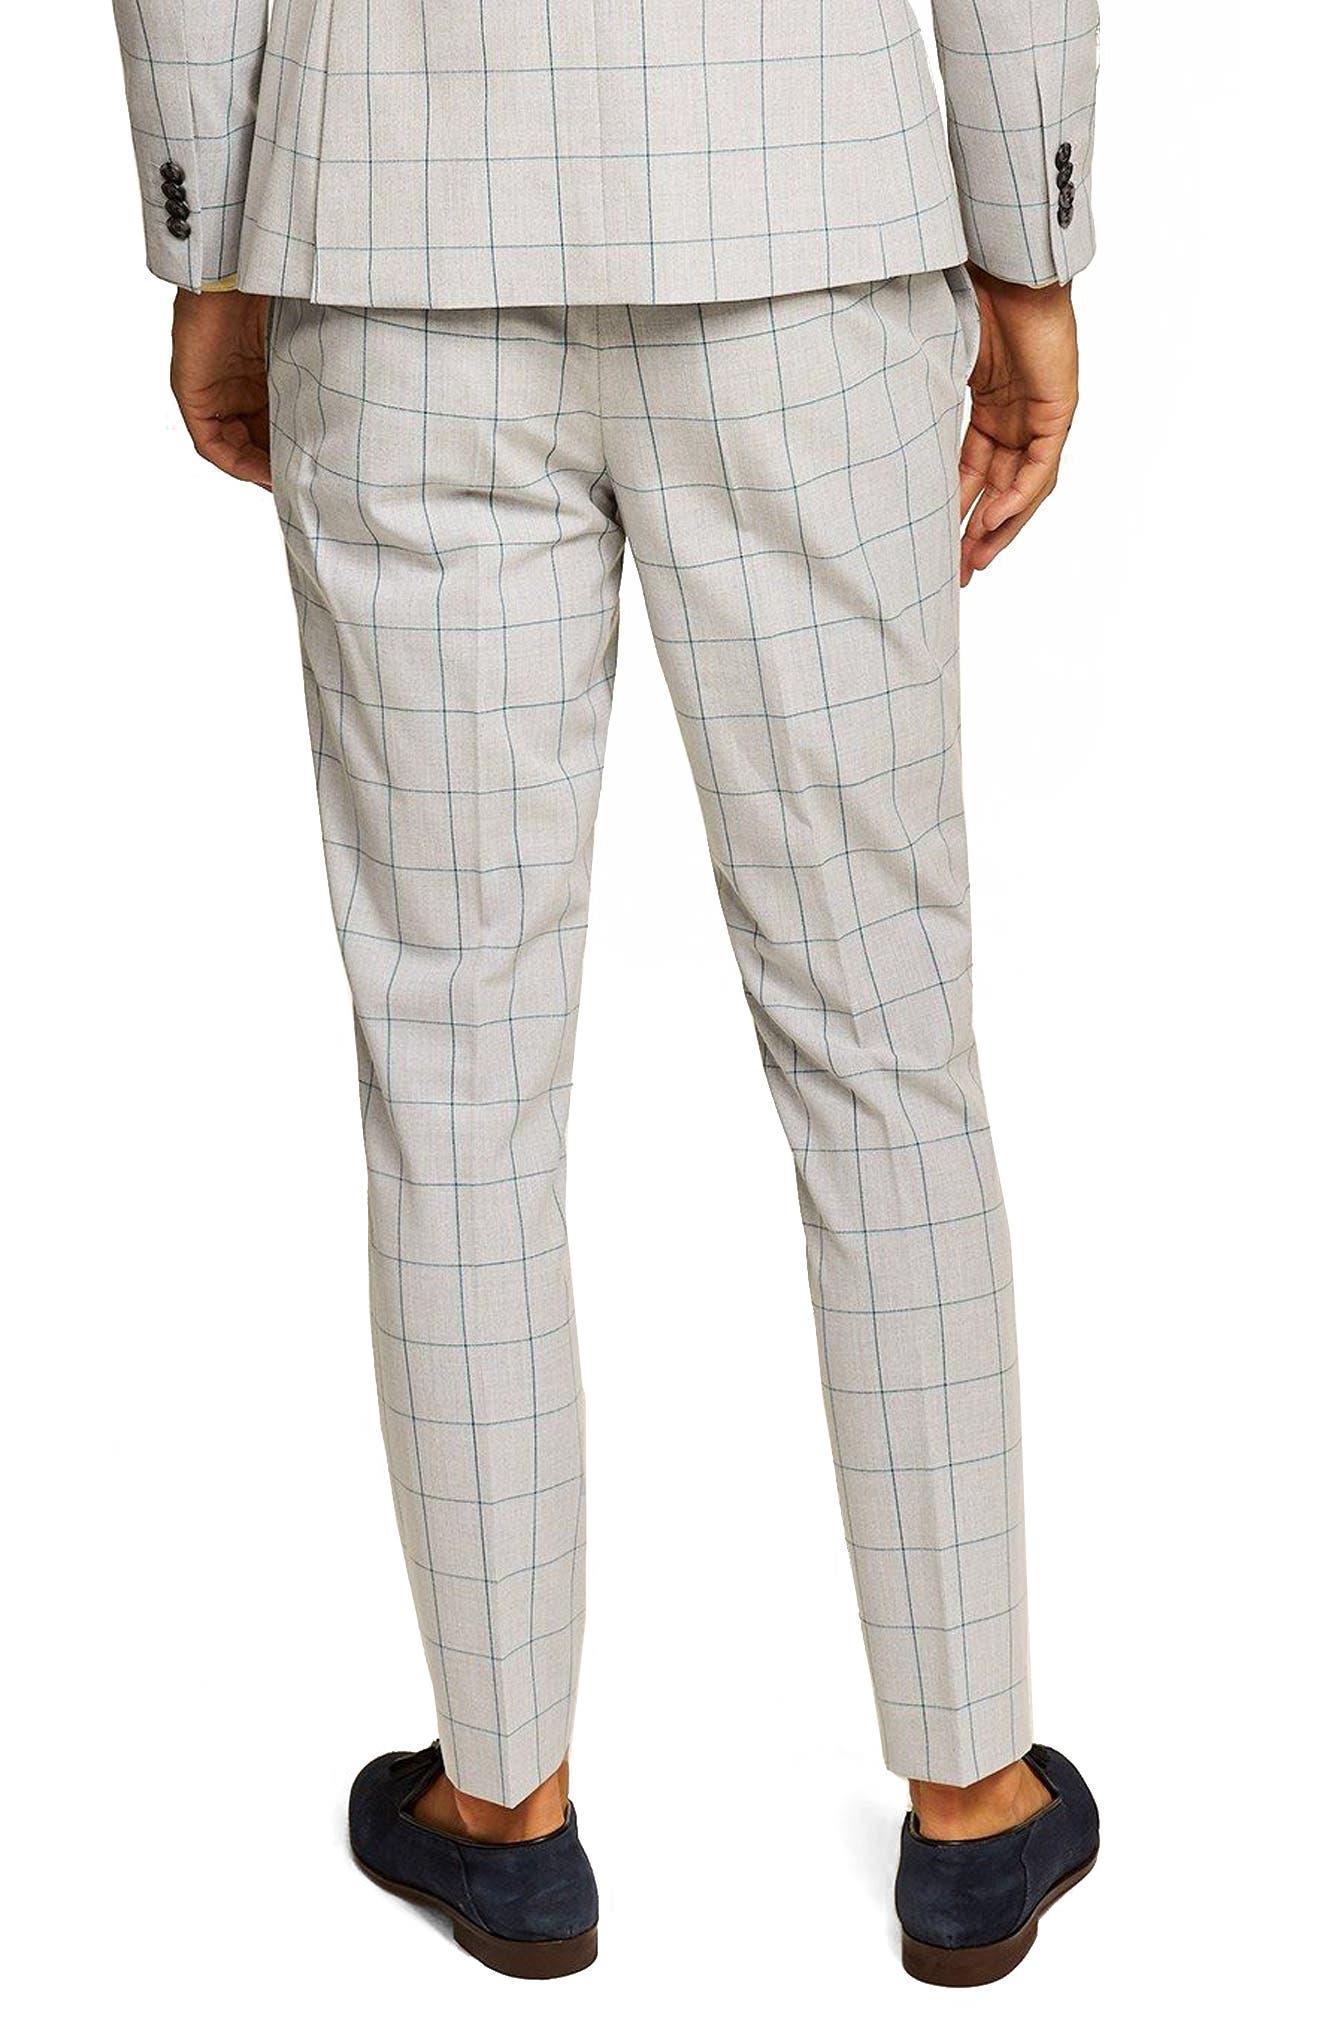 TOPMAN, Muscle Fit Check Suit Trousers, Alternate thumbnail 2, color, 300